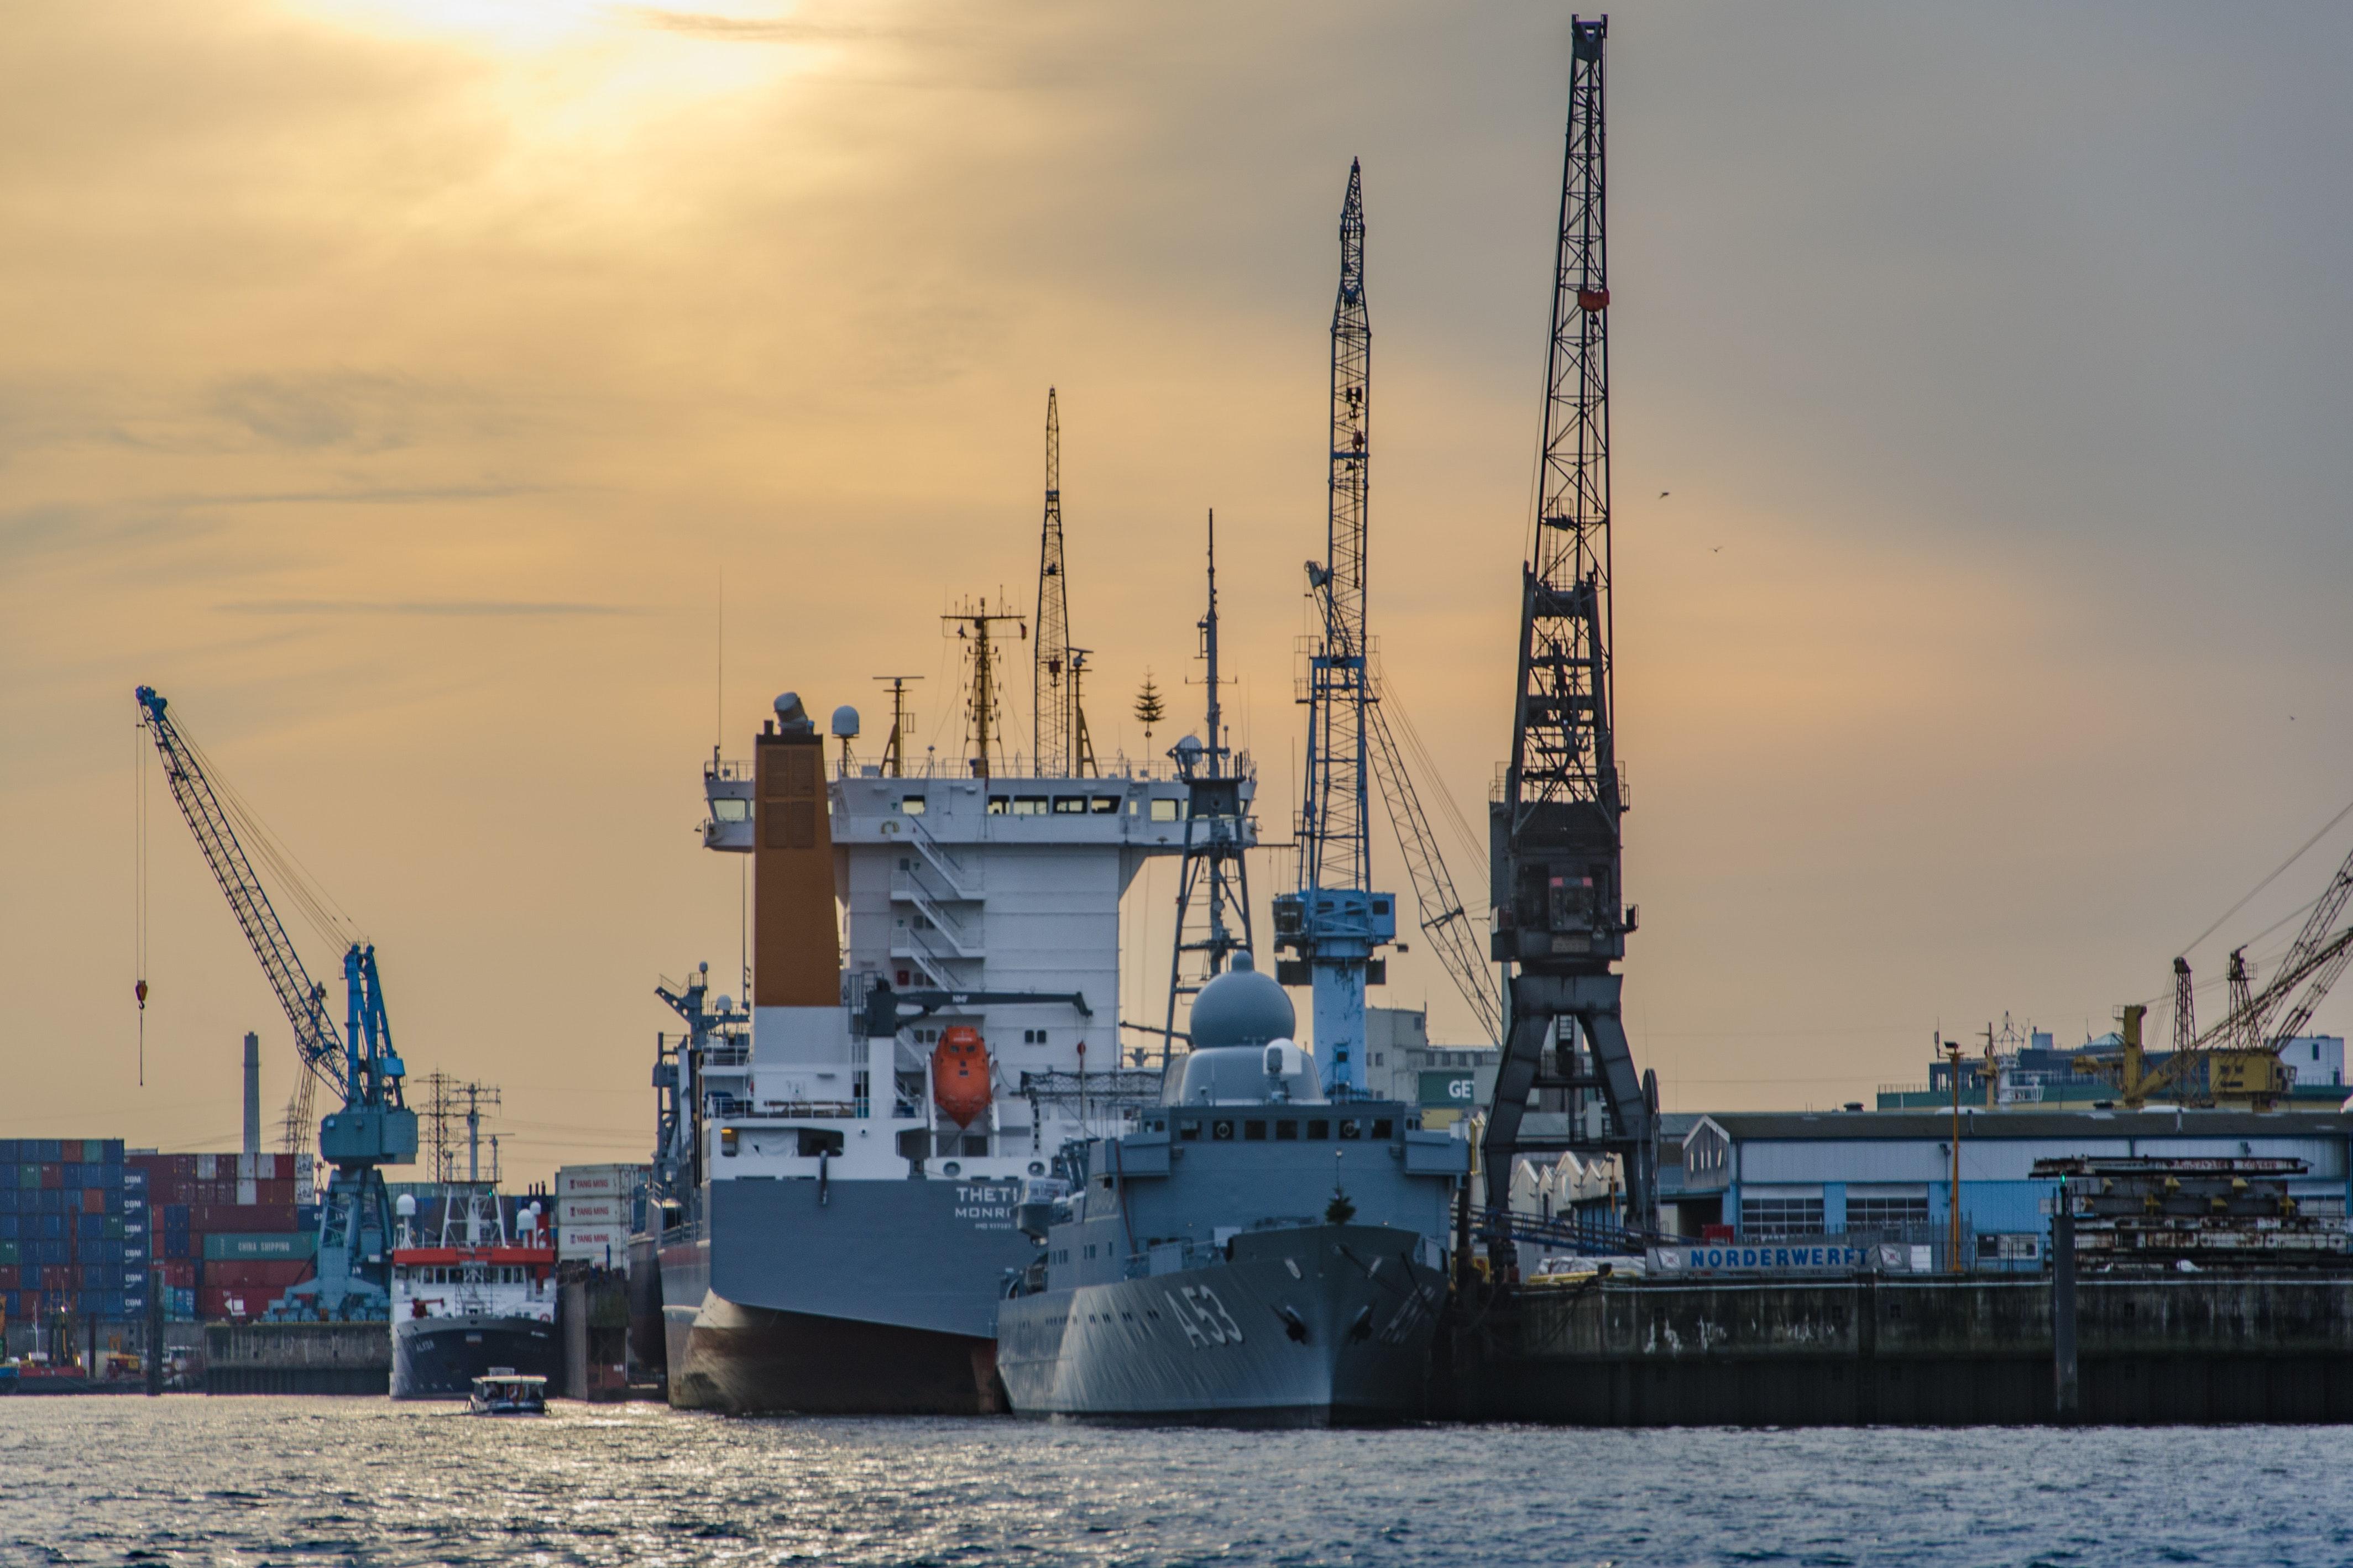 boat-business-cargo-70418.jpg